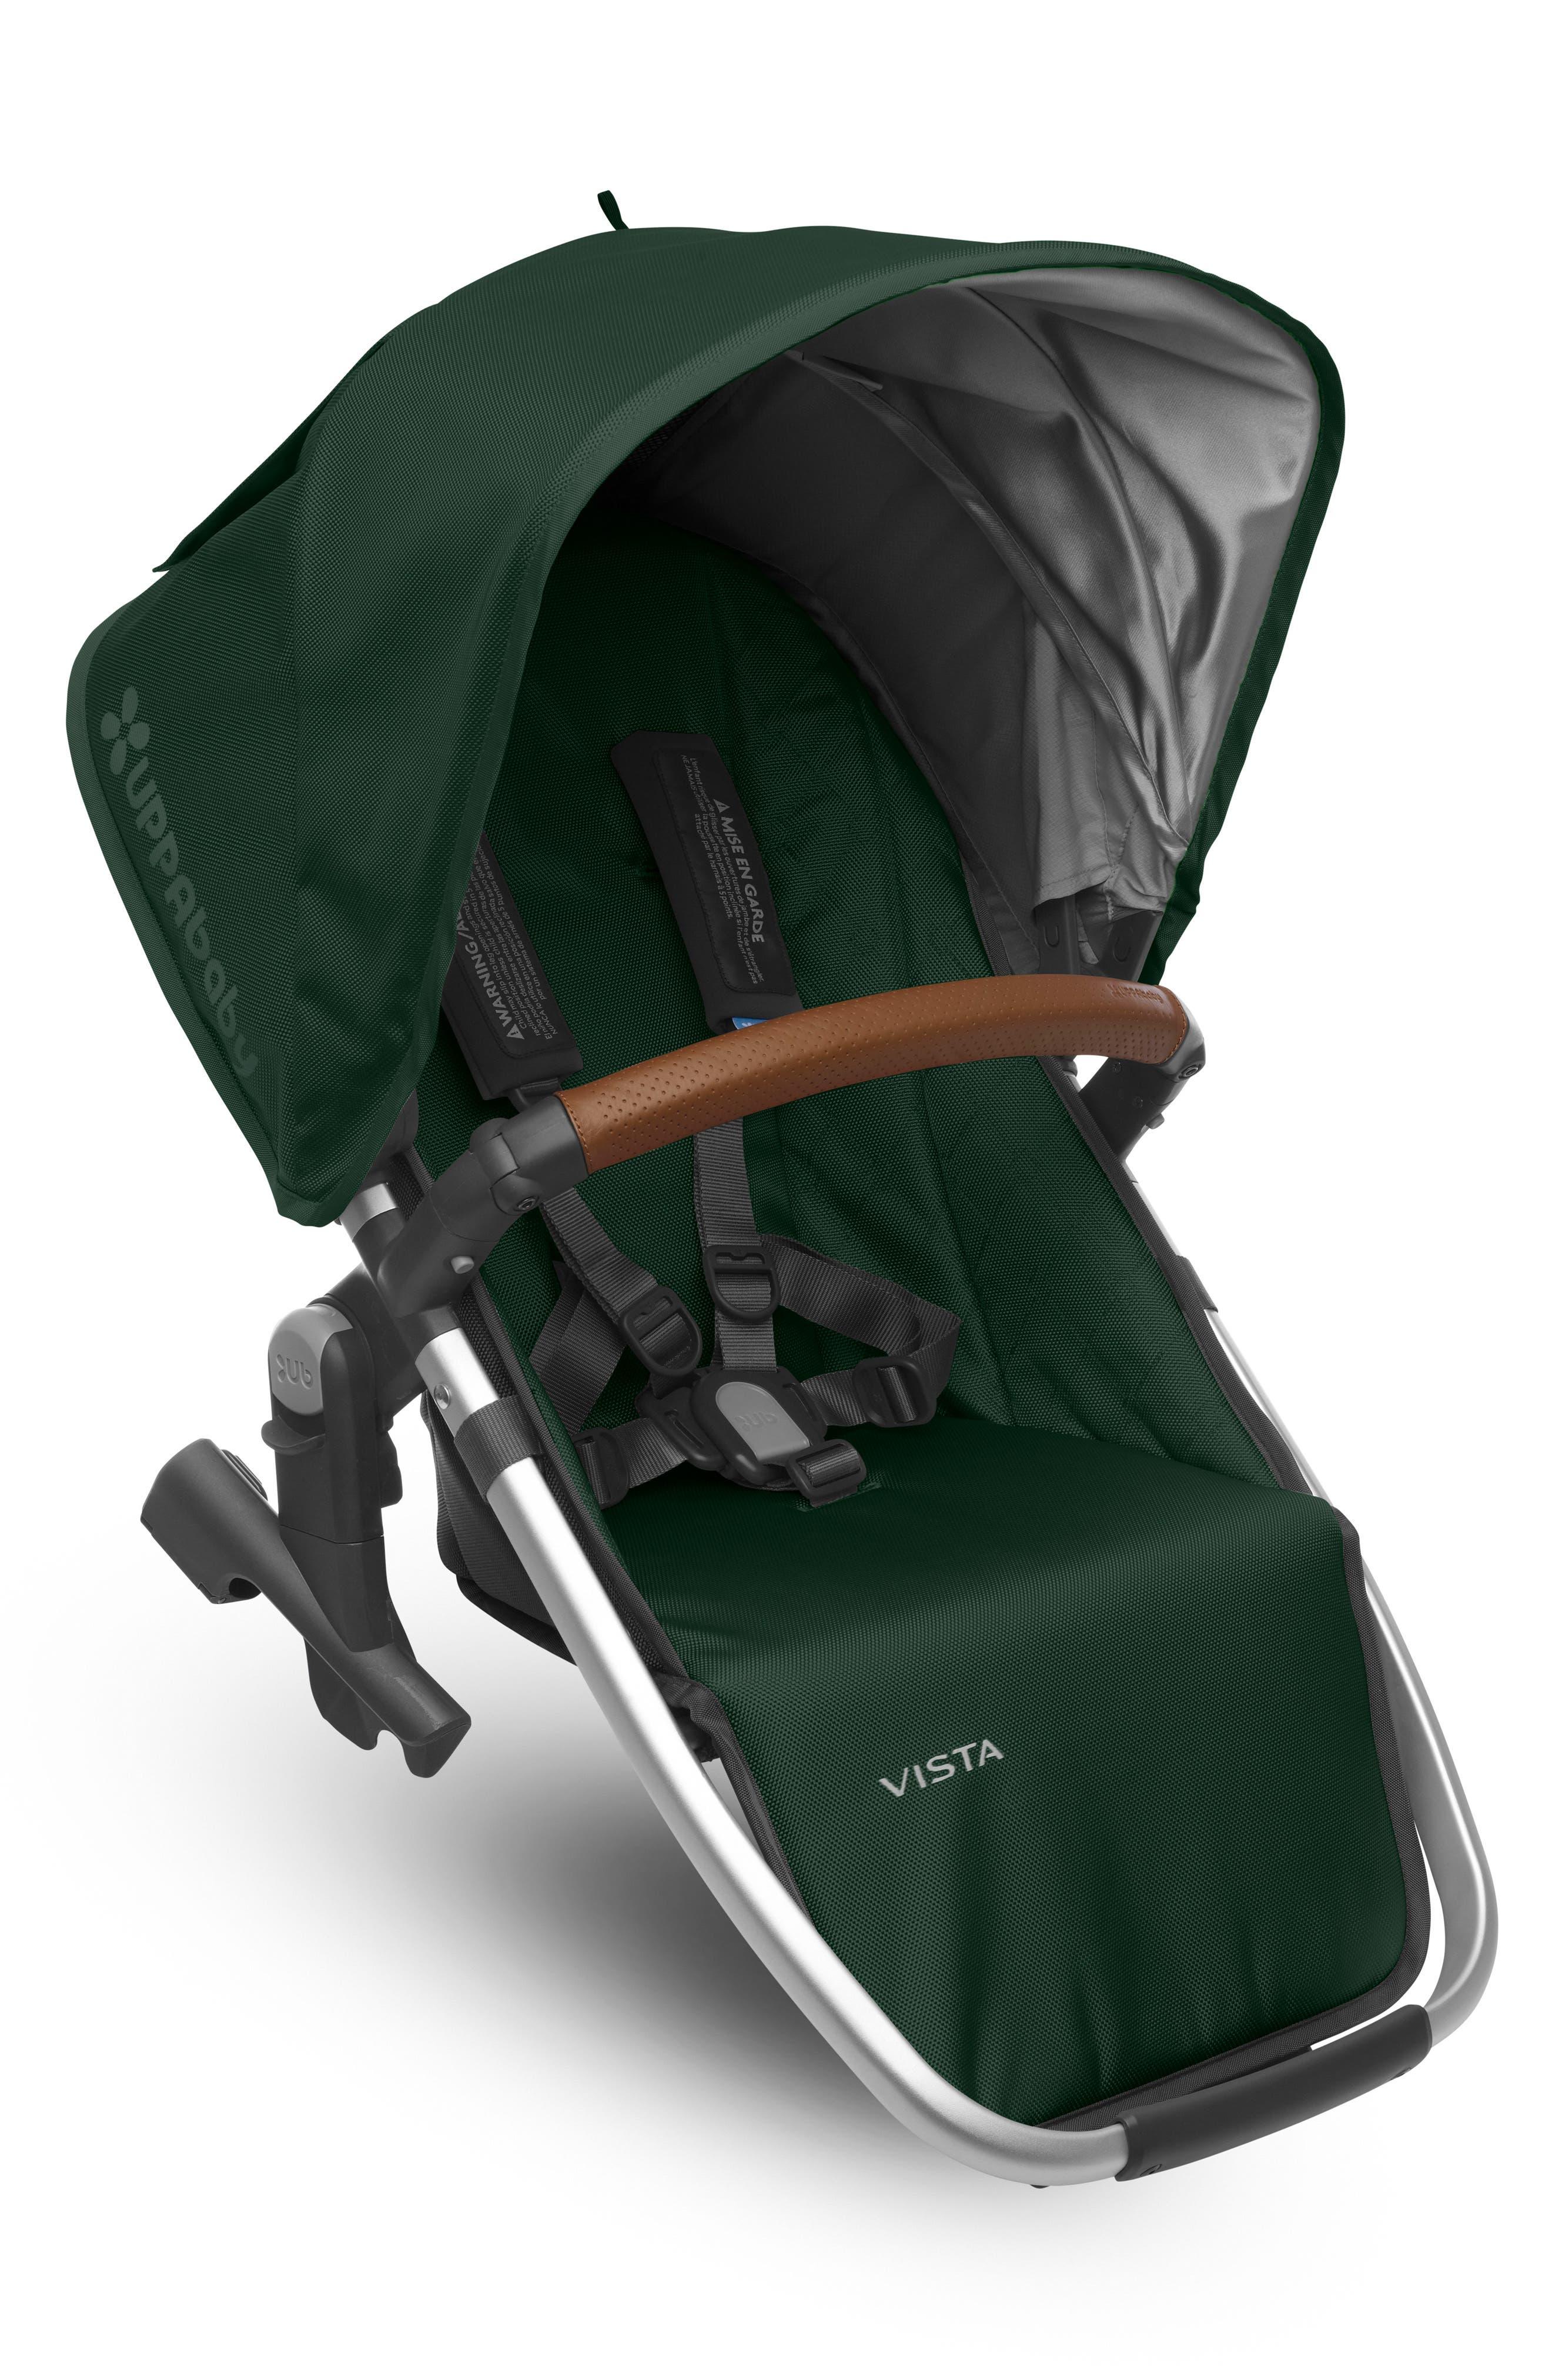 VISTA Stroller Rumble Seat,                         Main,                         color, Hunter/ Silver